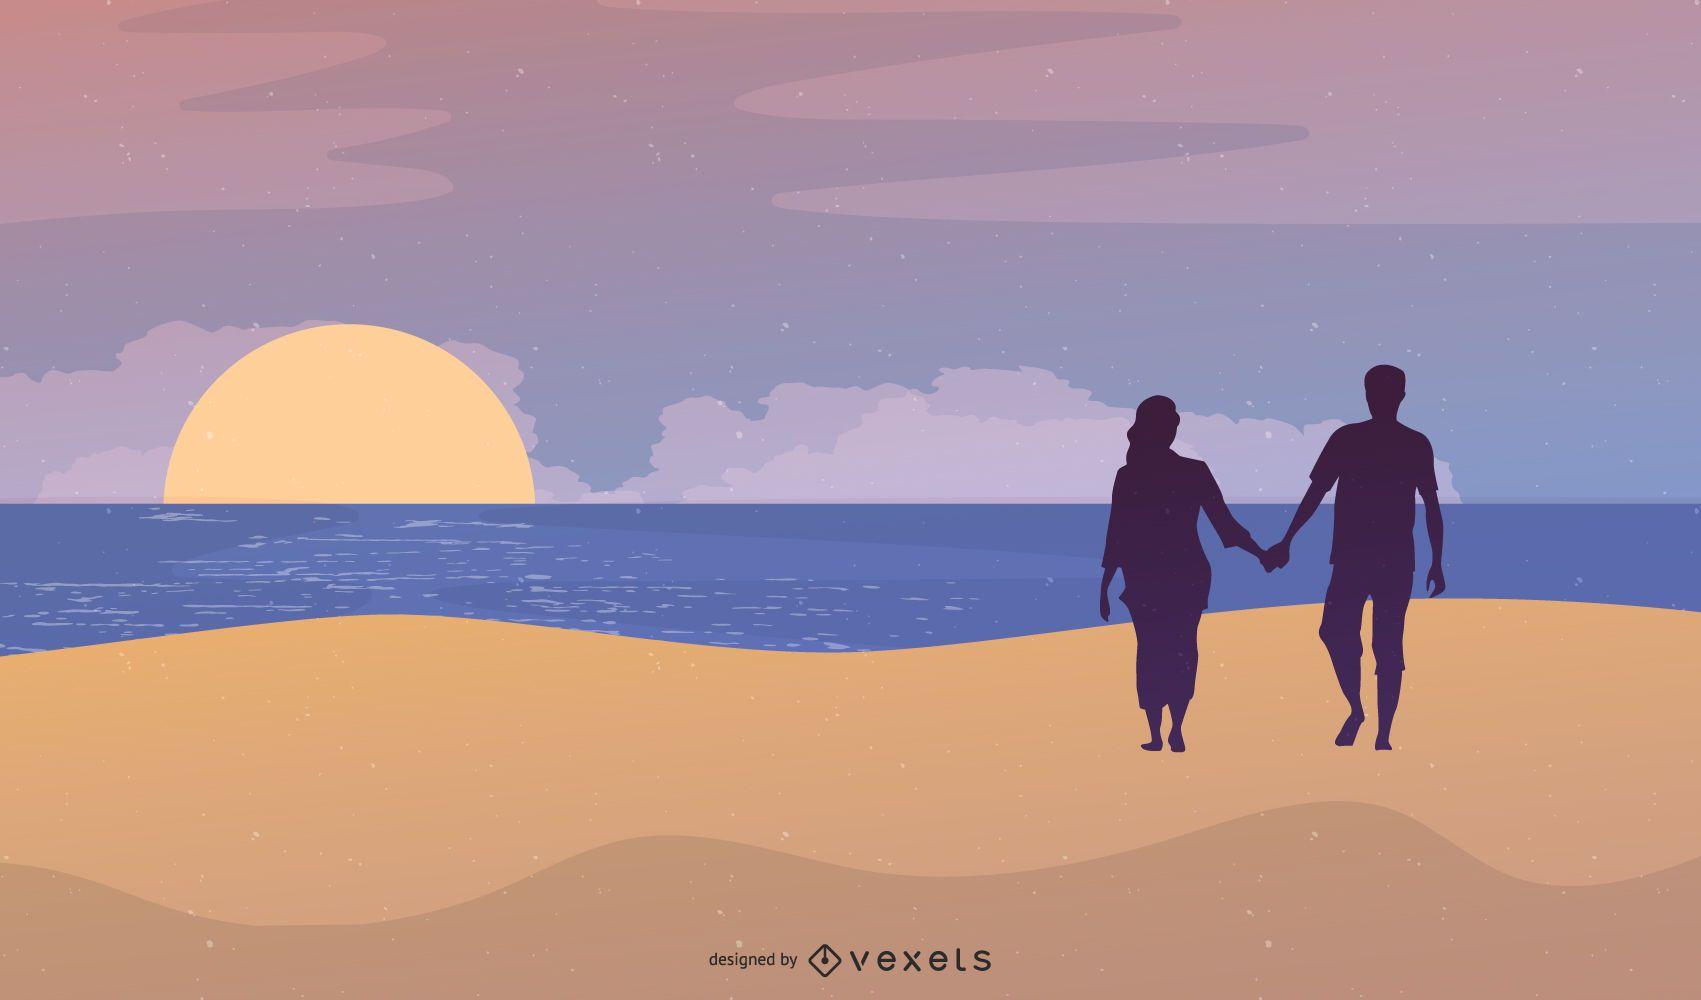 Summer Beach People Silhouette Design